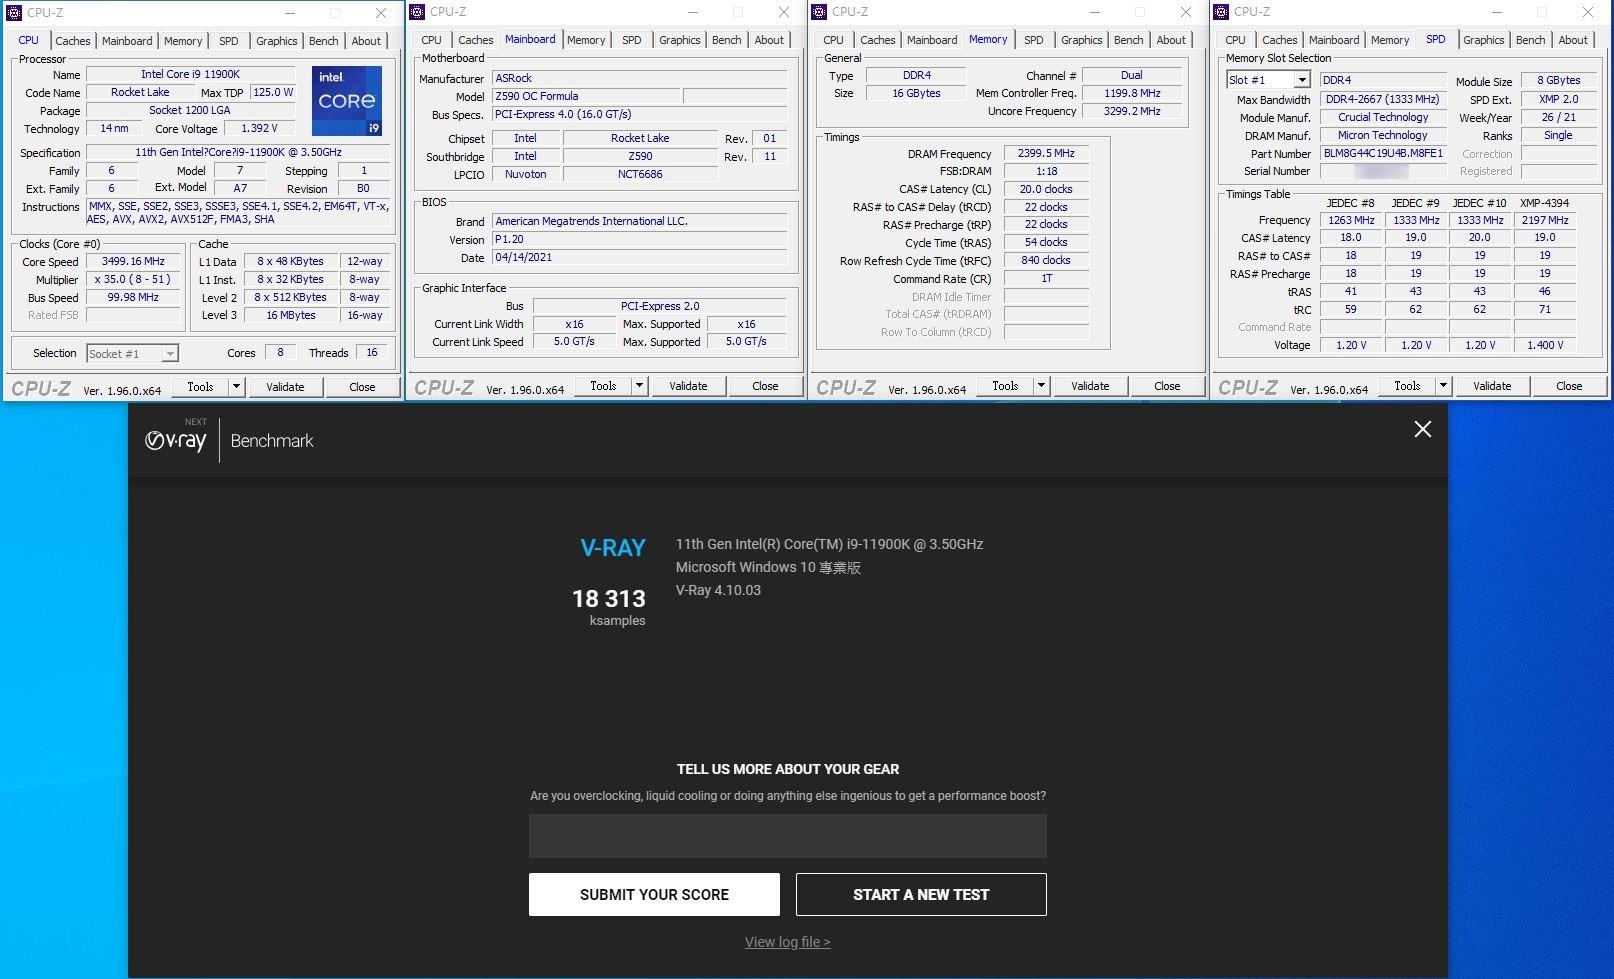 Crucial Ballistix MAX DDR4-4400電競記憶體-輕鬆獲得高頻率效能...2083